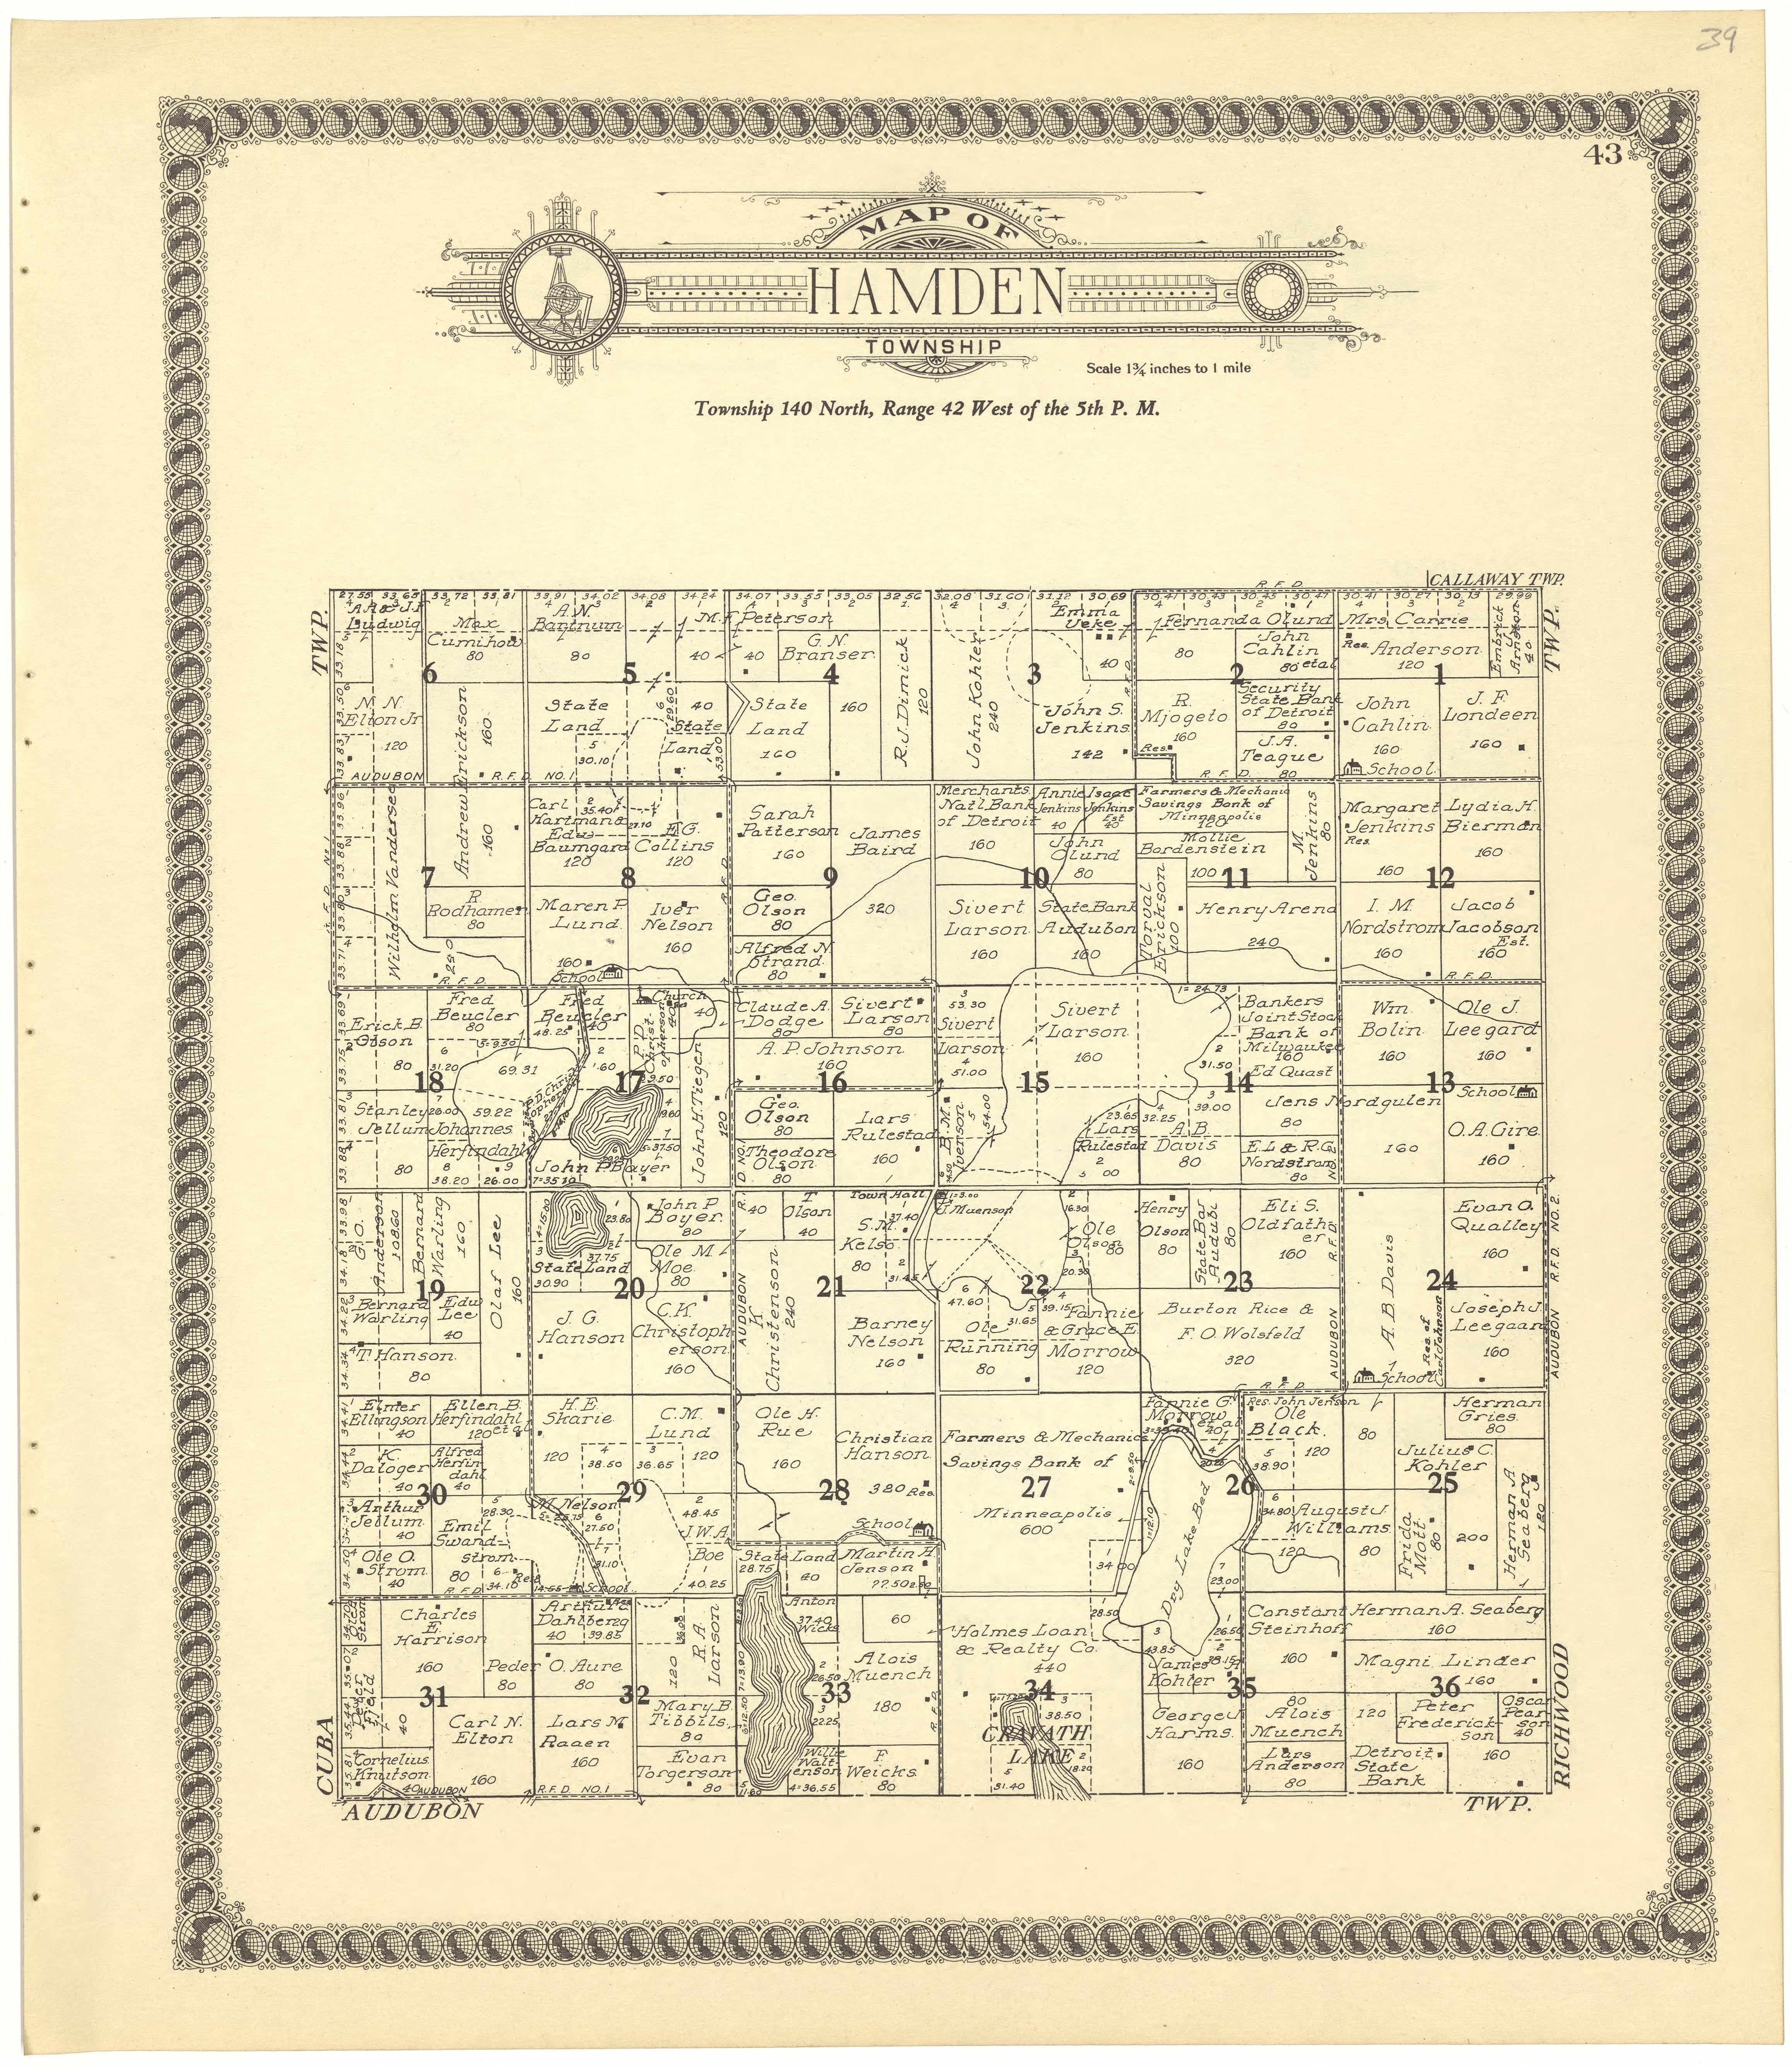 John R. Borchert Map Library